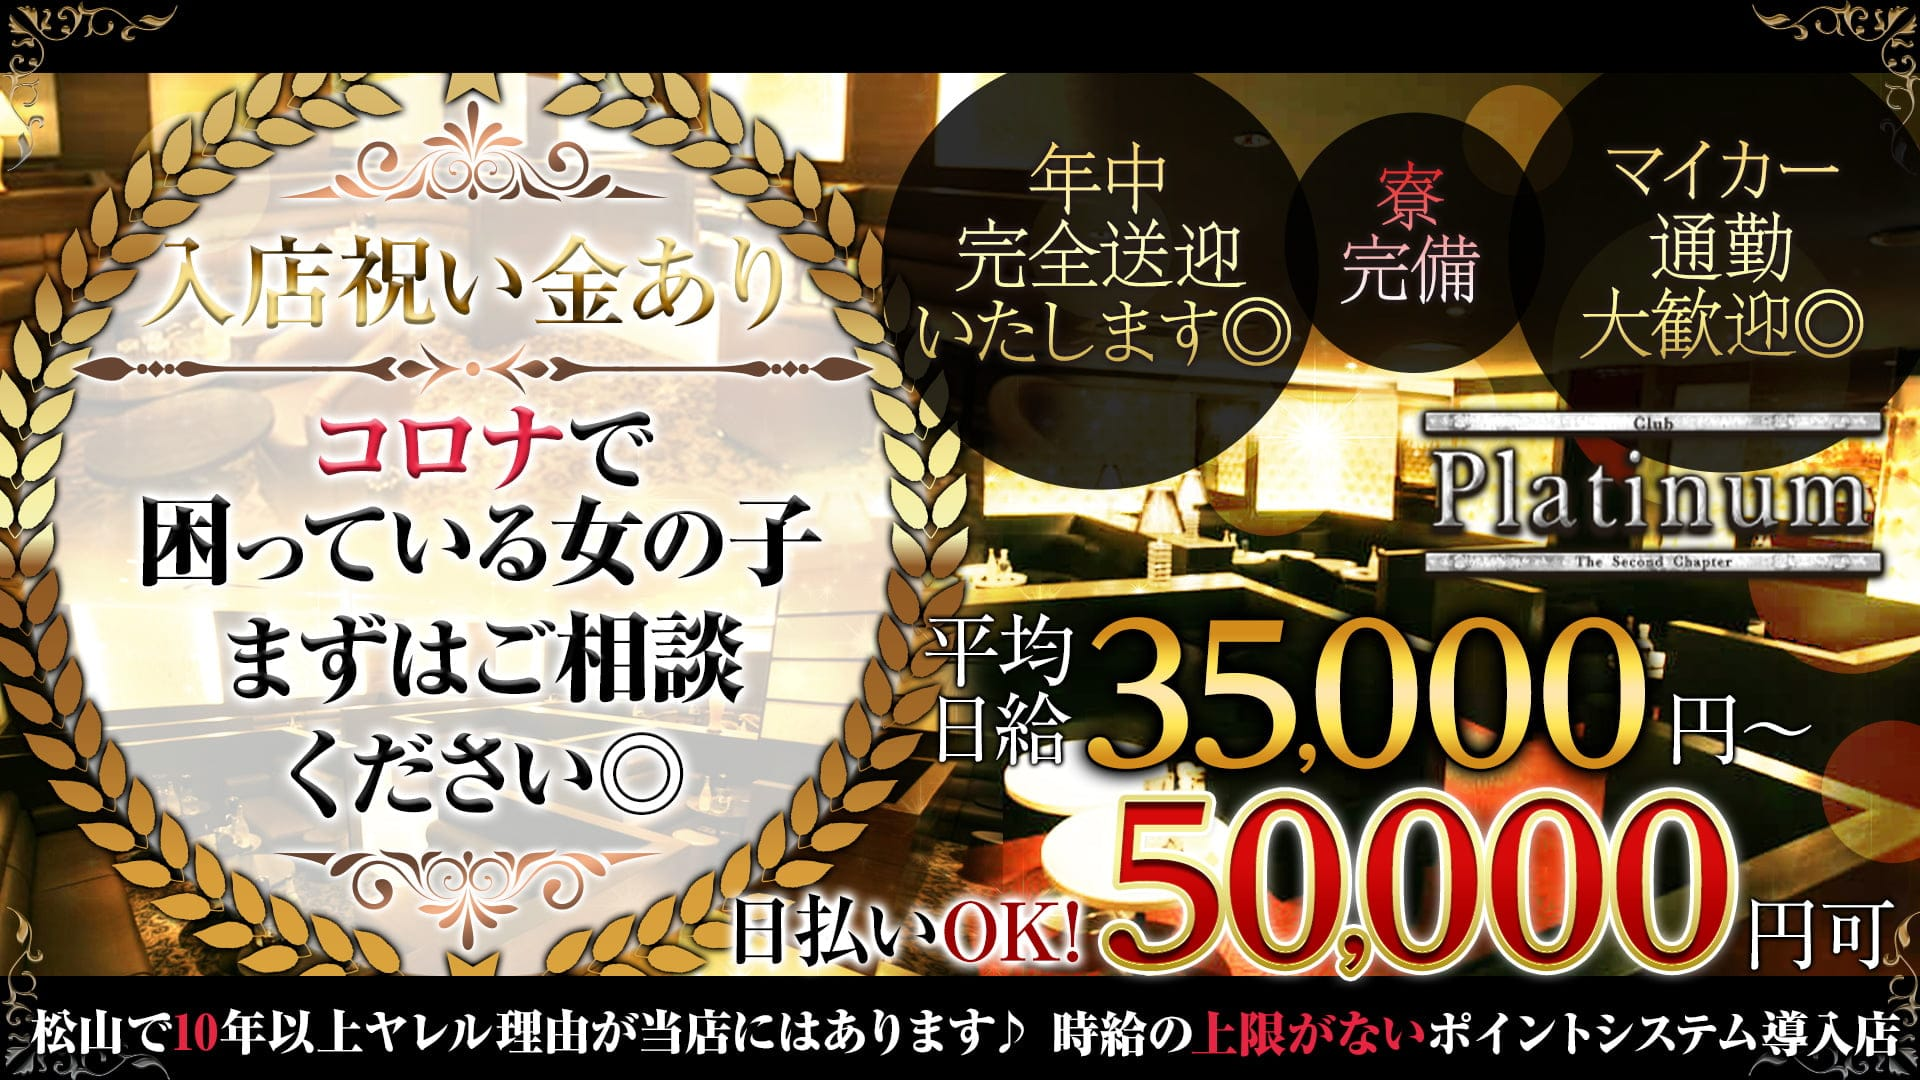 Club Platinum(プラチナ)【公式求人・体入情報】 松山(沖縄)キャバクラ TOP画像